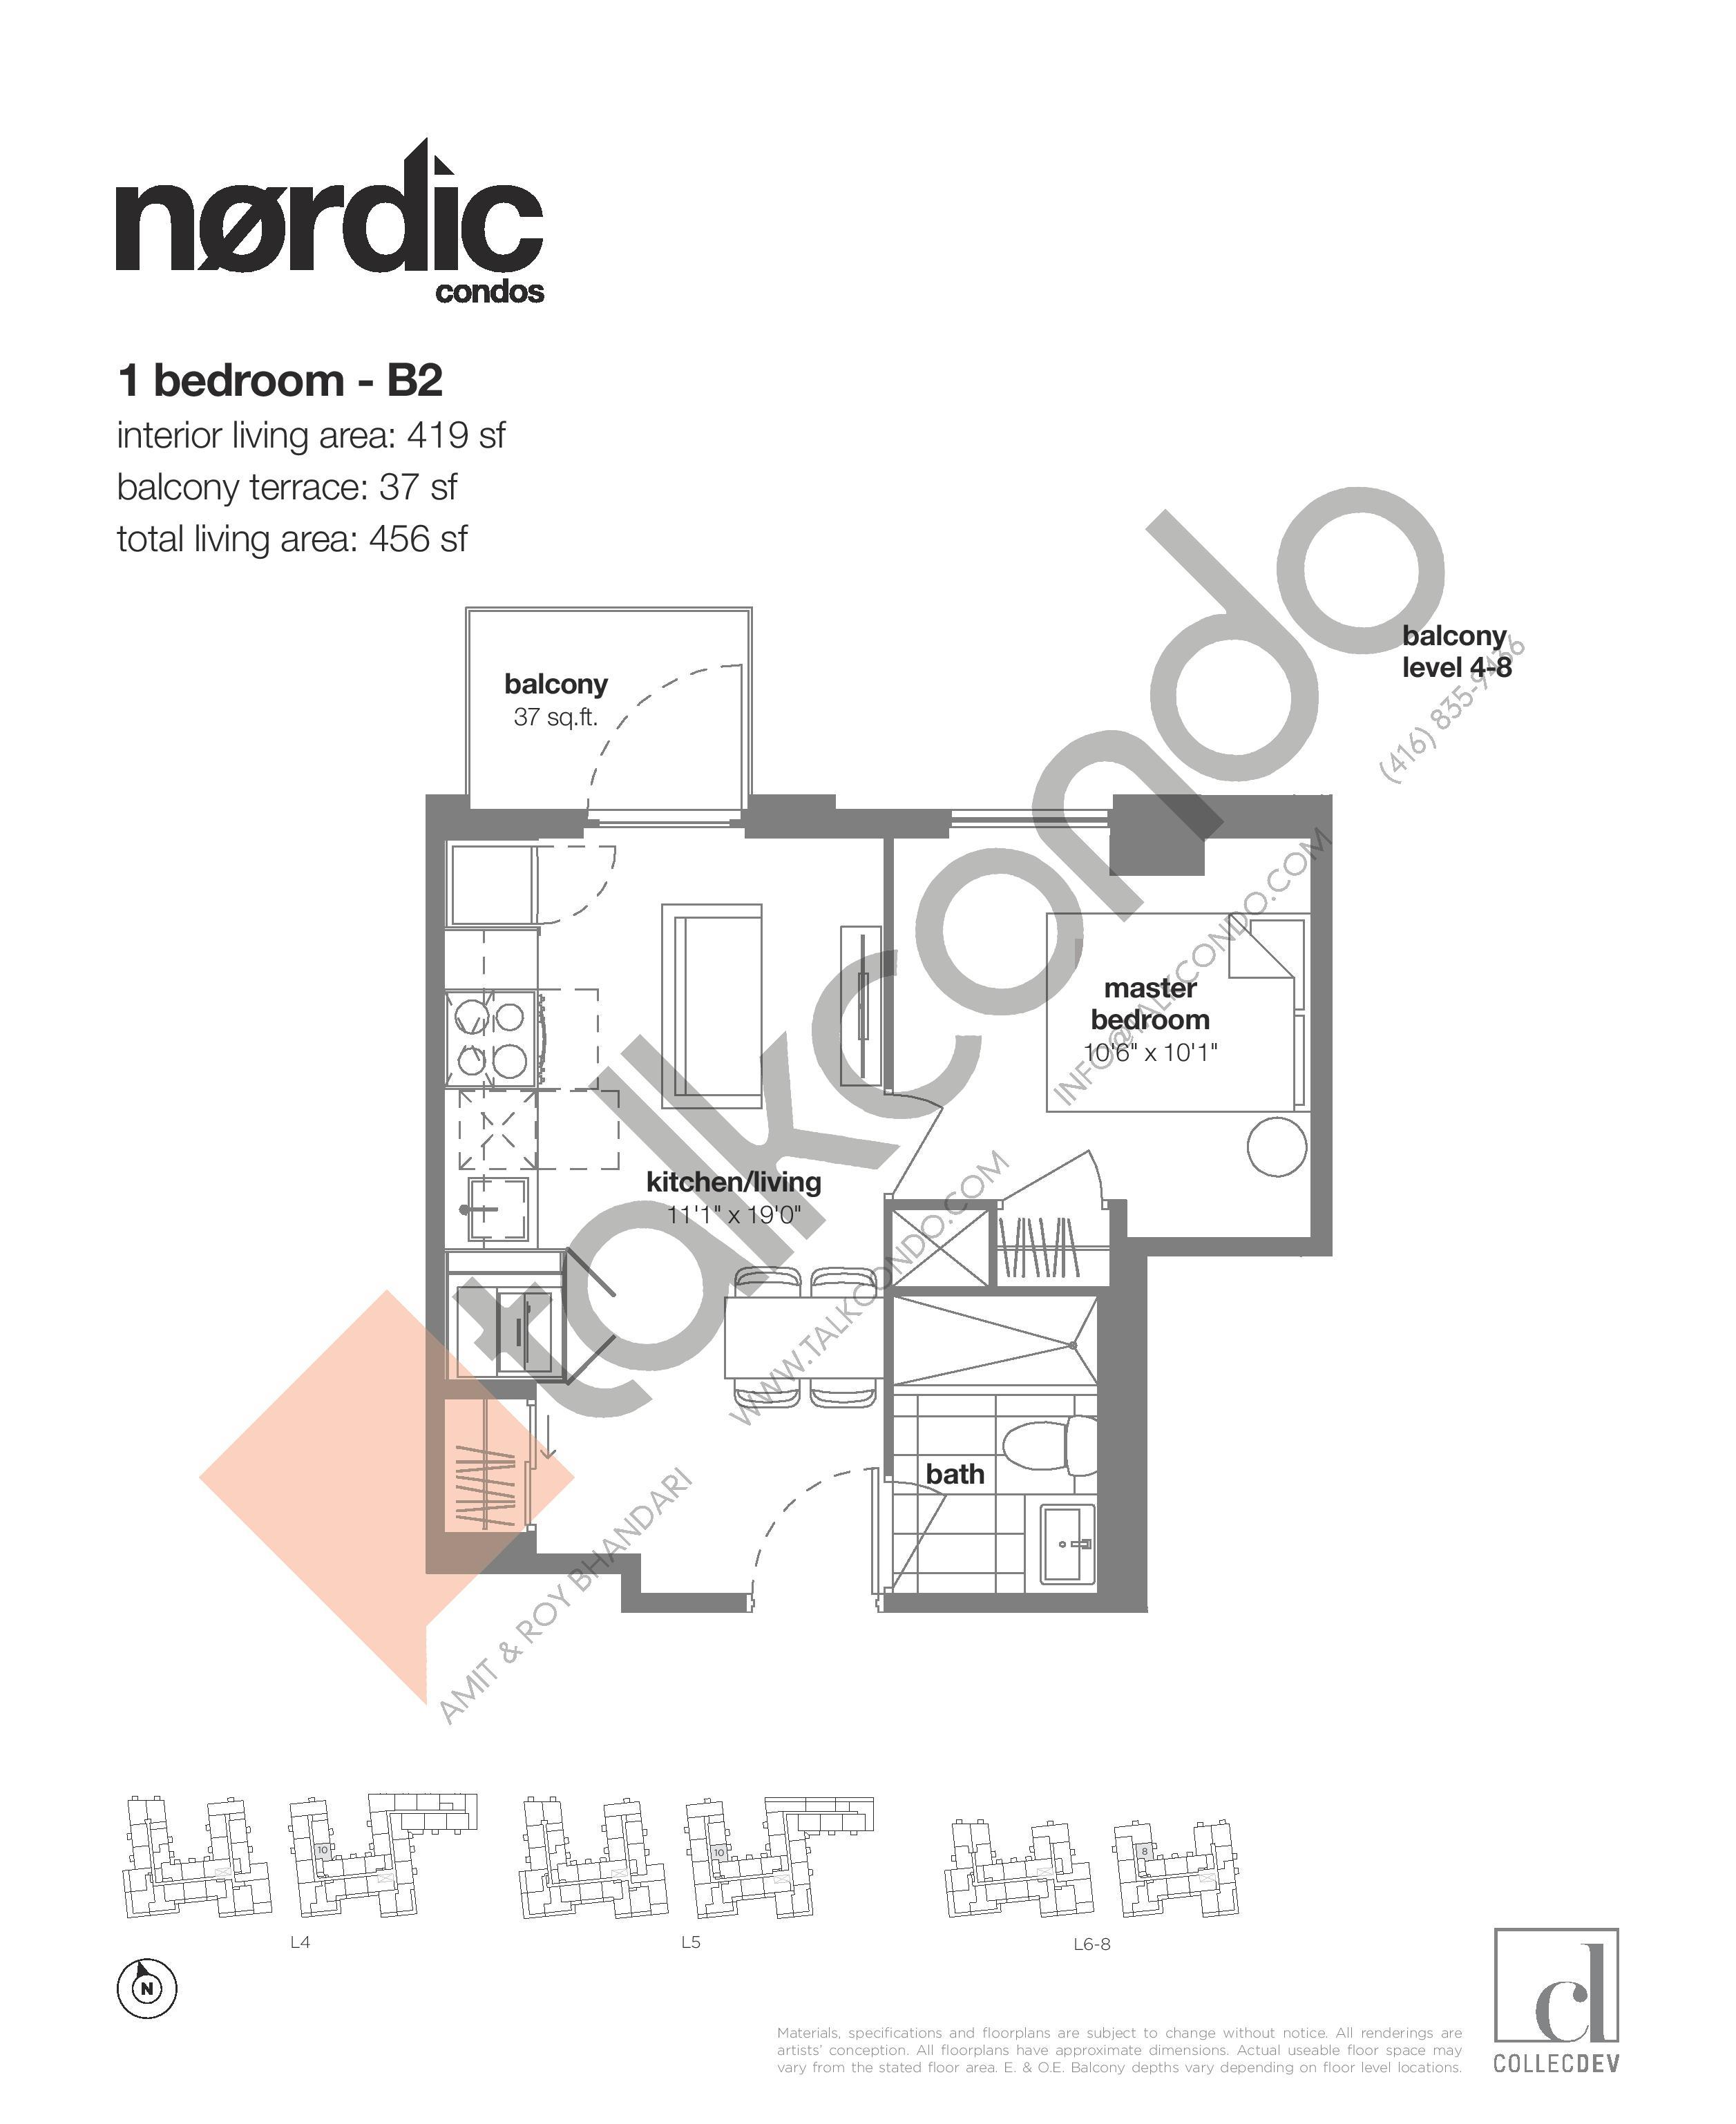 B2 Floor Plan at Nordic Condos - 419 sq.ft